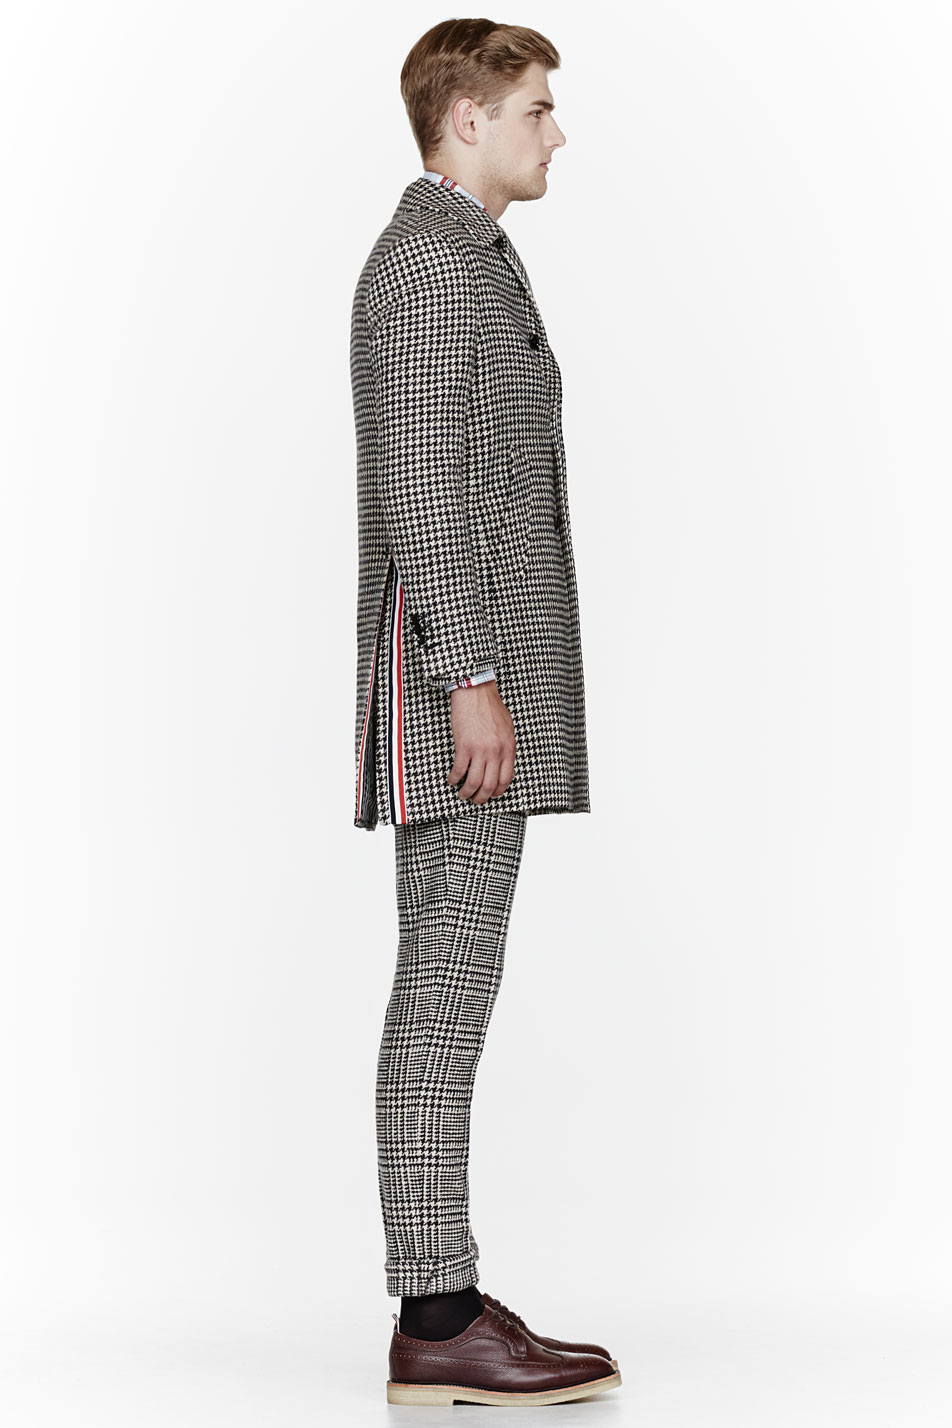 Glen Plaid Suit x Herringbone Coat Thom Browne 4